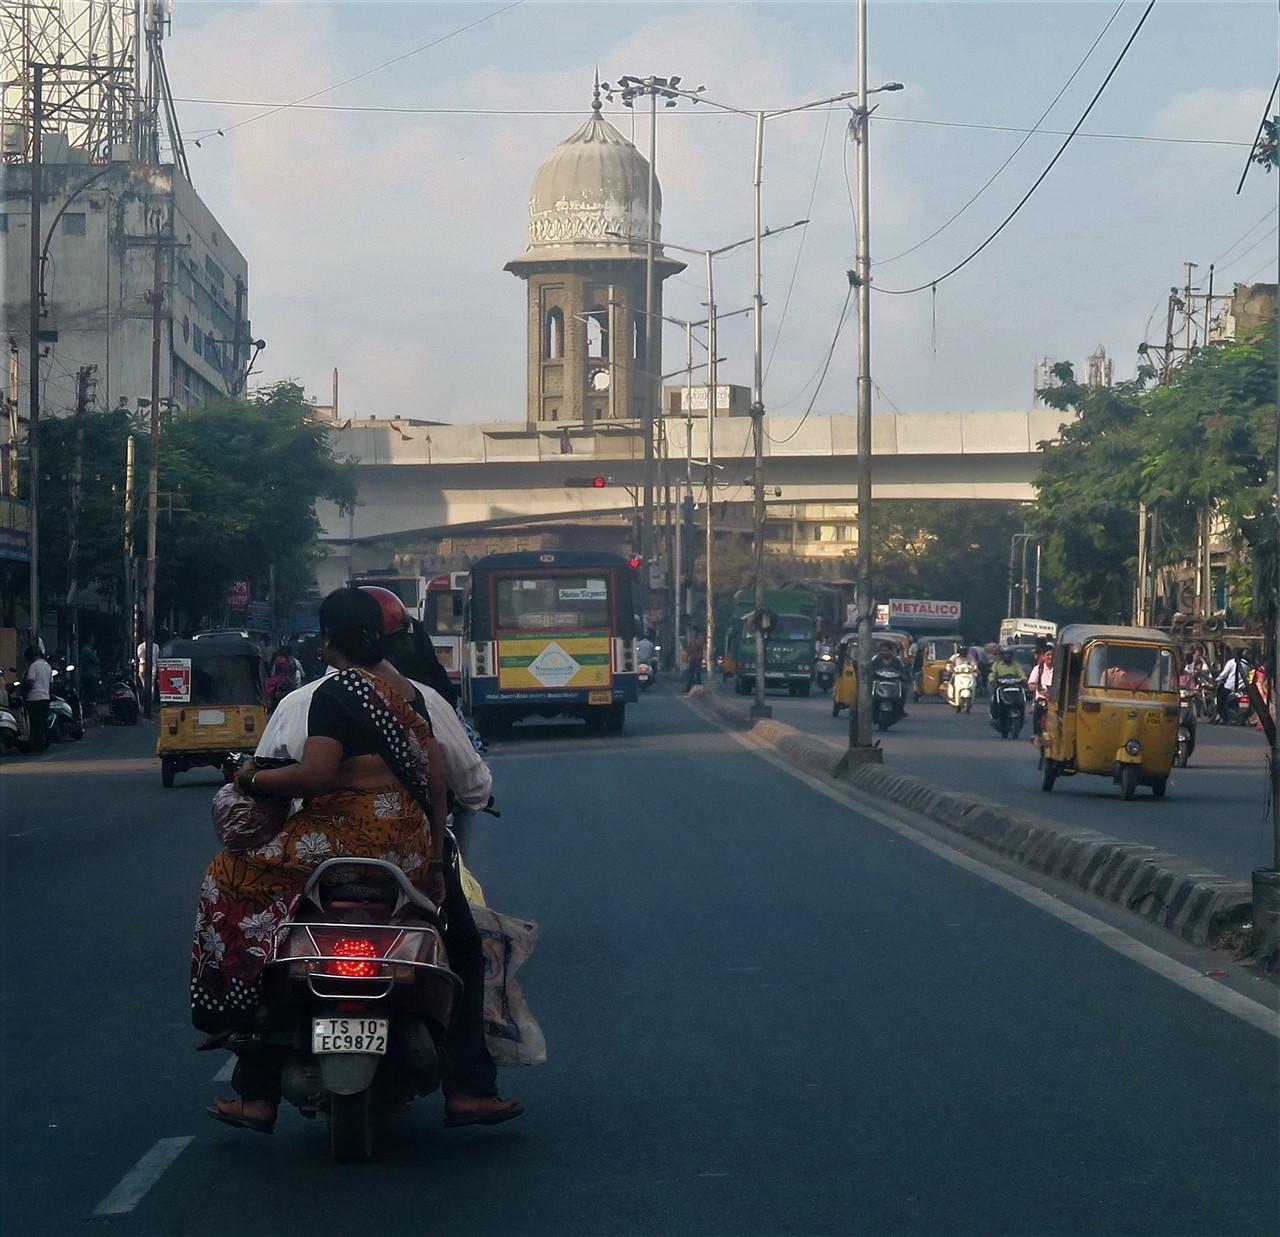 2017 11 17 169 Hyderabad.jpg